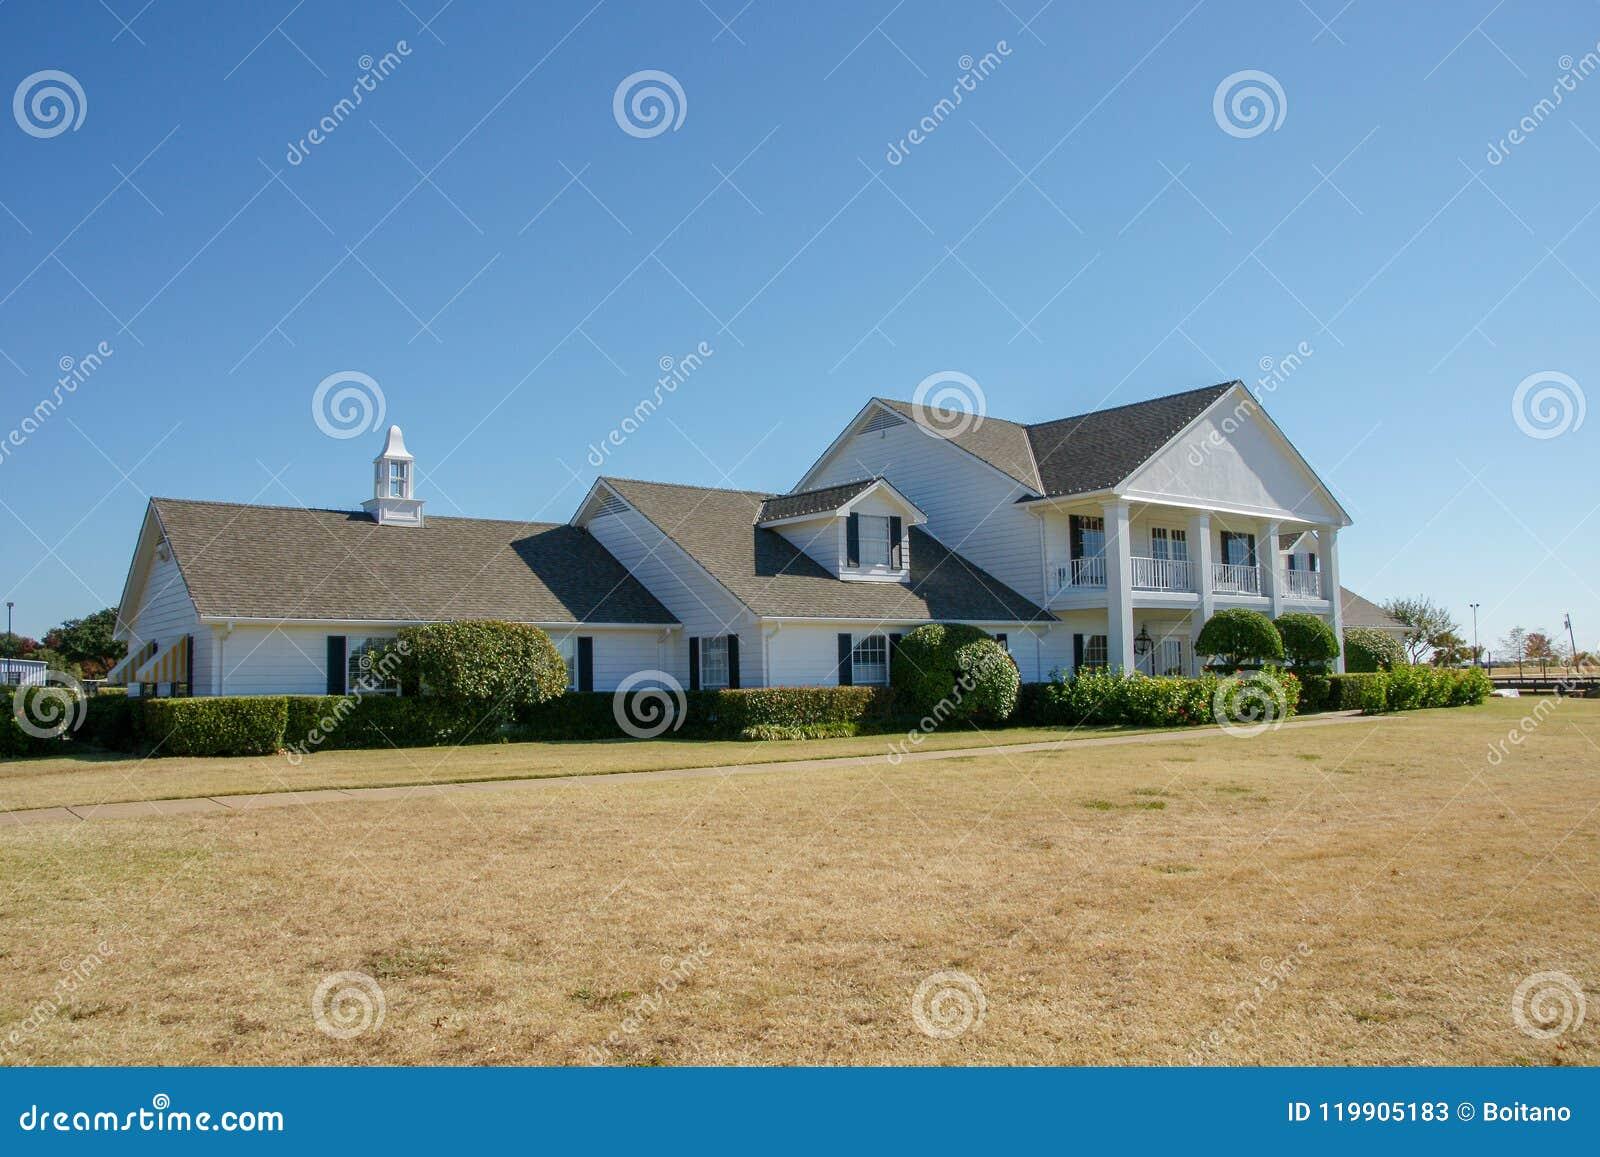 Vista dianteira da casa de rancho de Southfork, Parker, Texas, Estados Unidos O rancho aparece na série de televisão Dallas